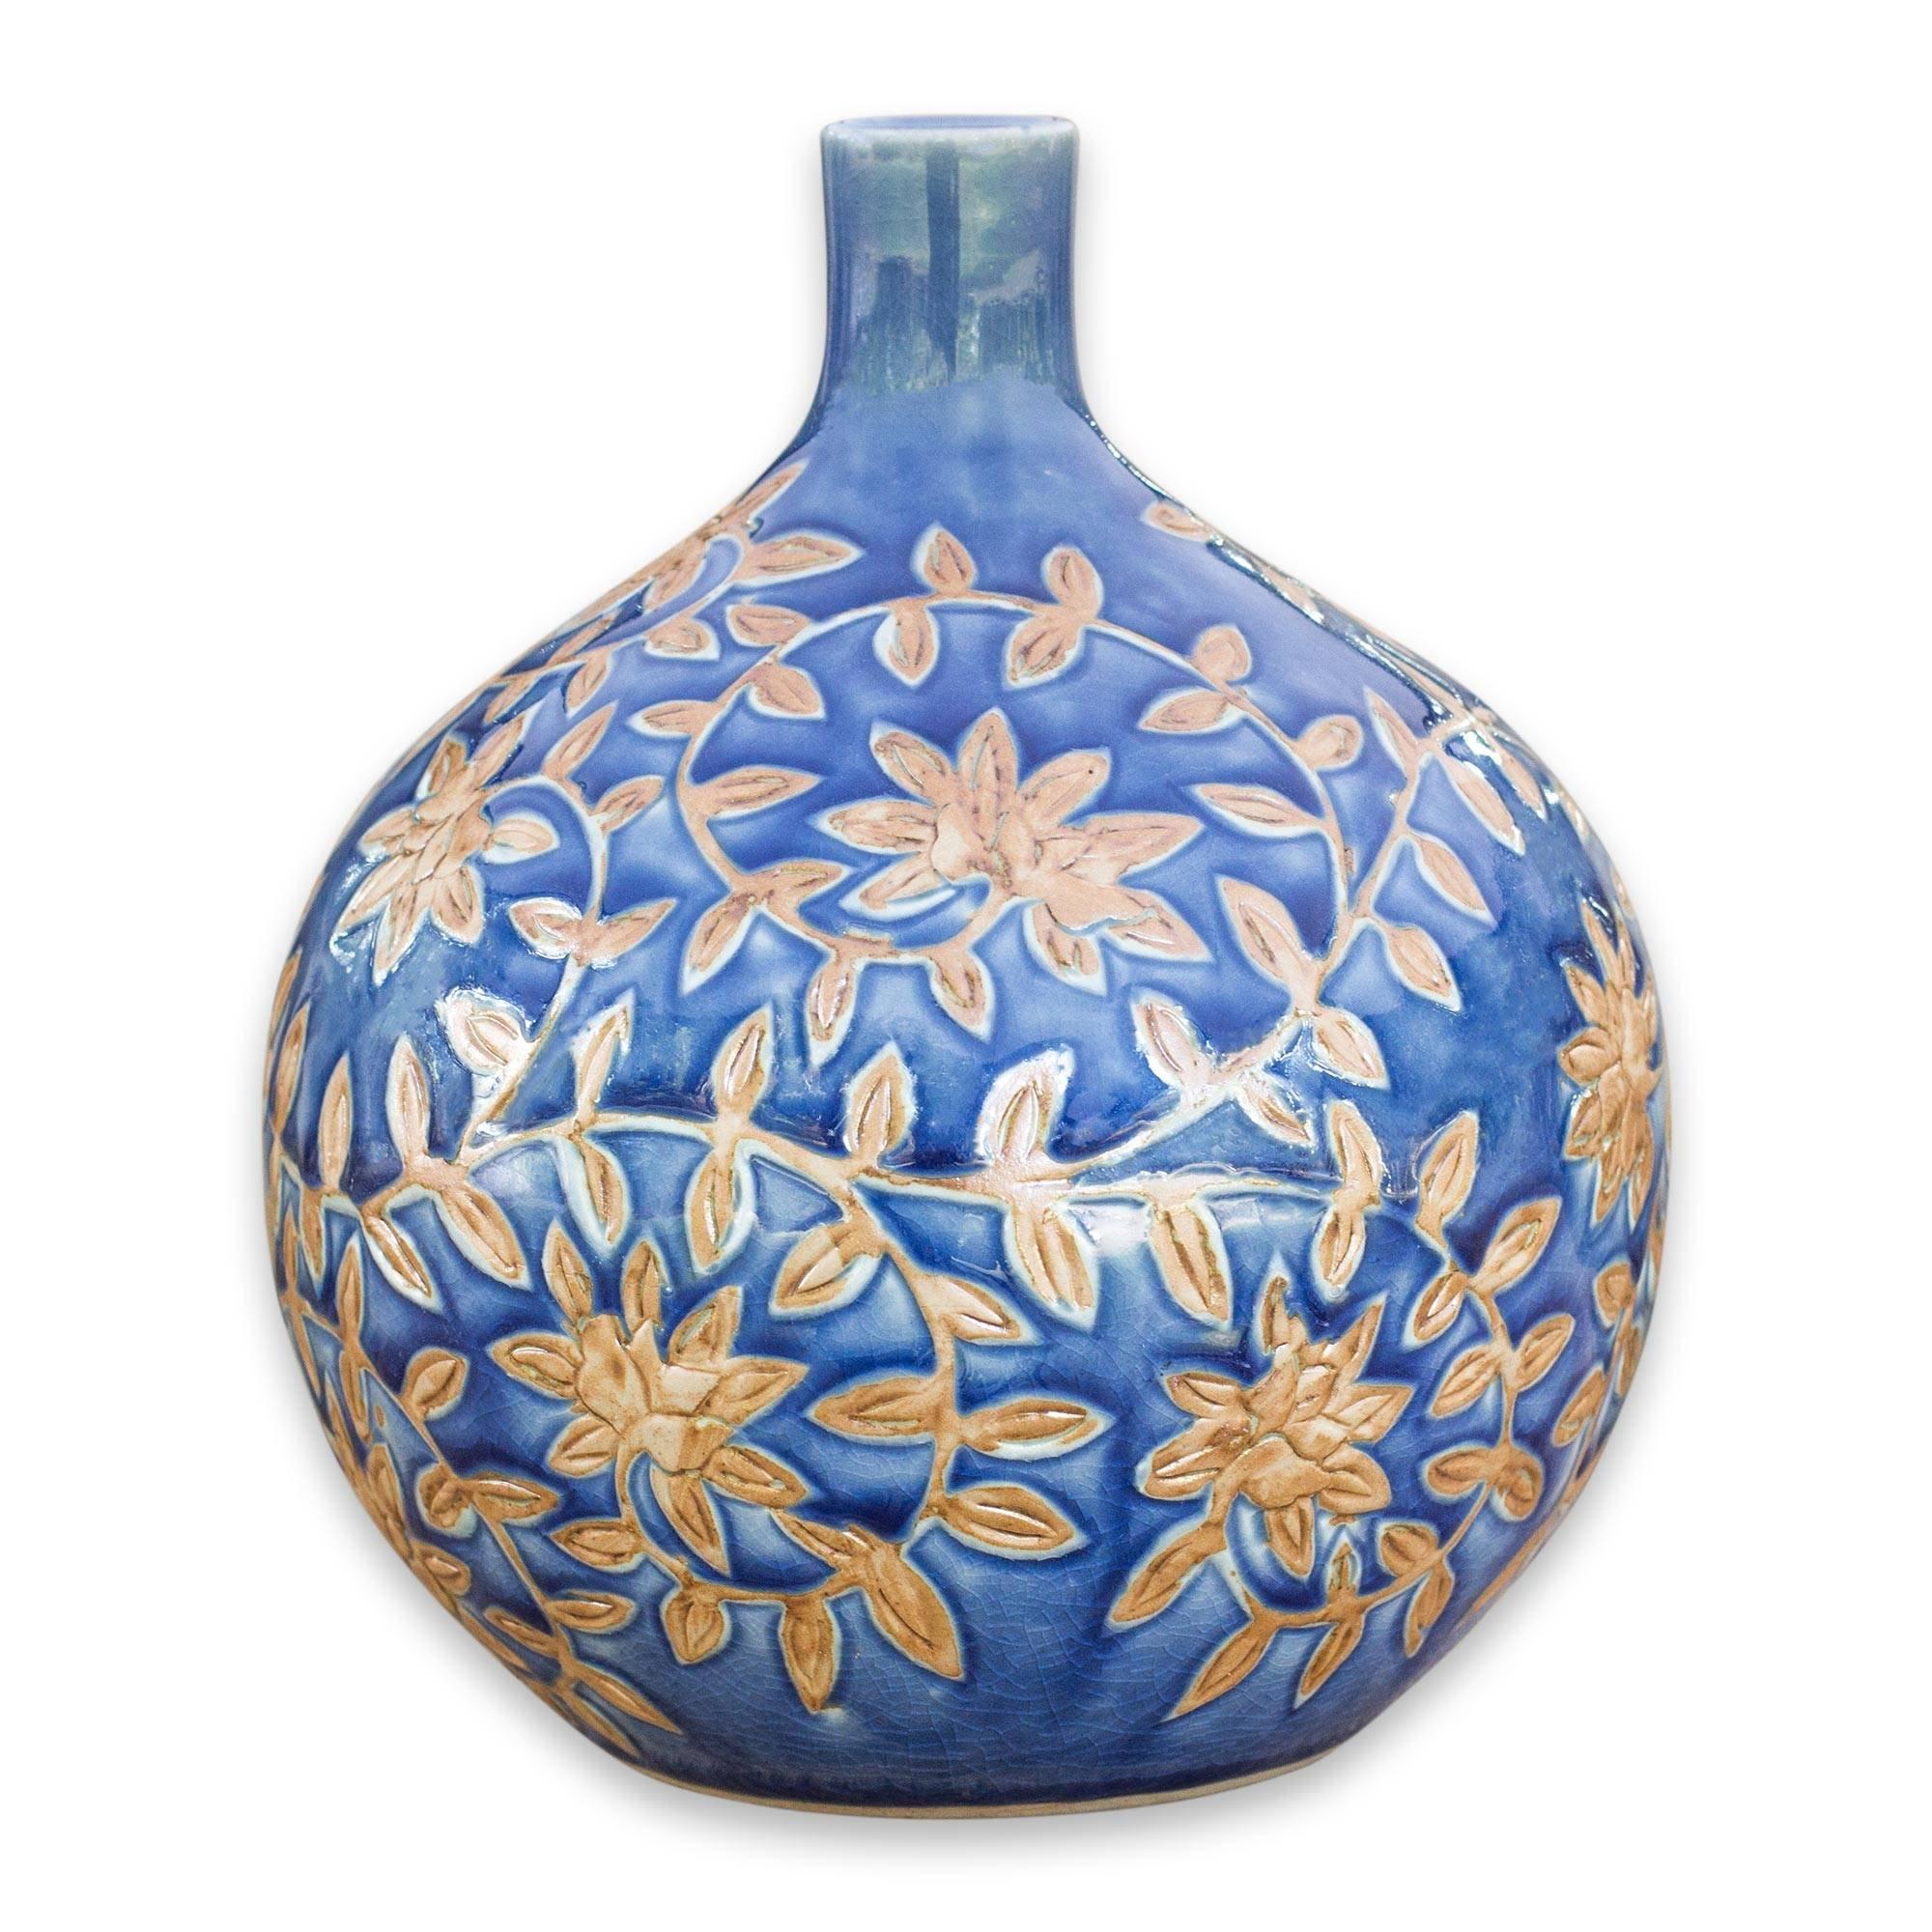 NOVICA Floral Ceramic Vase, Blue, 'Golden Jasmine'